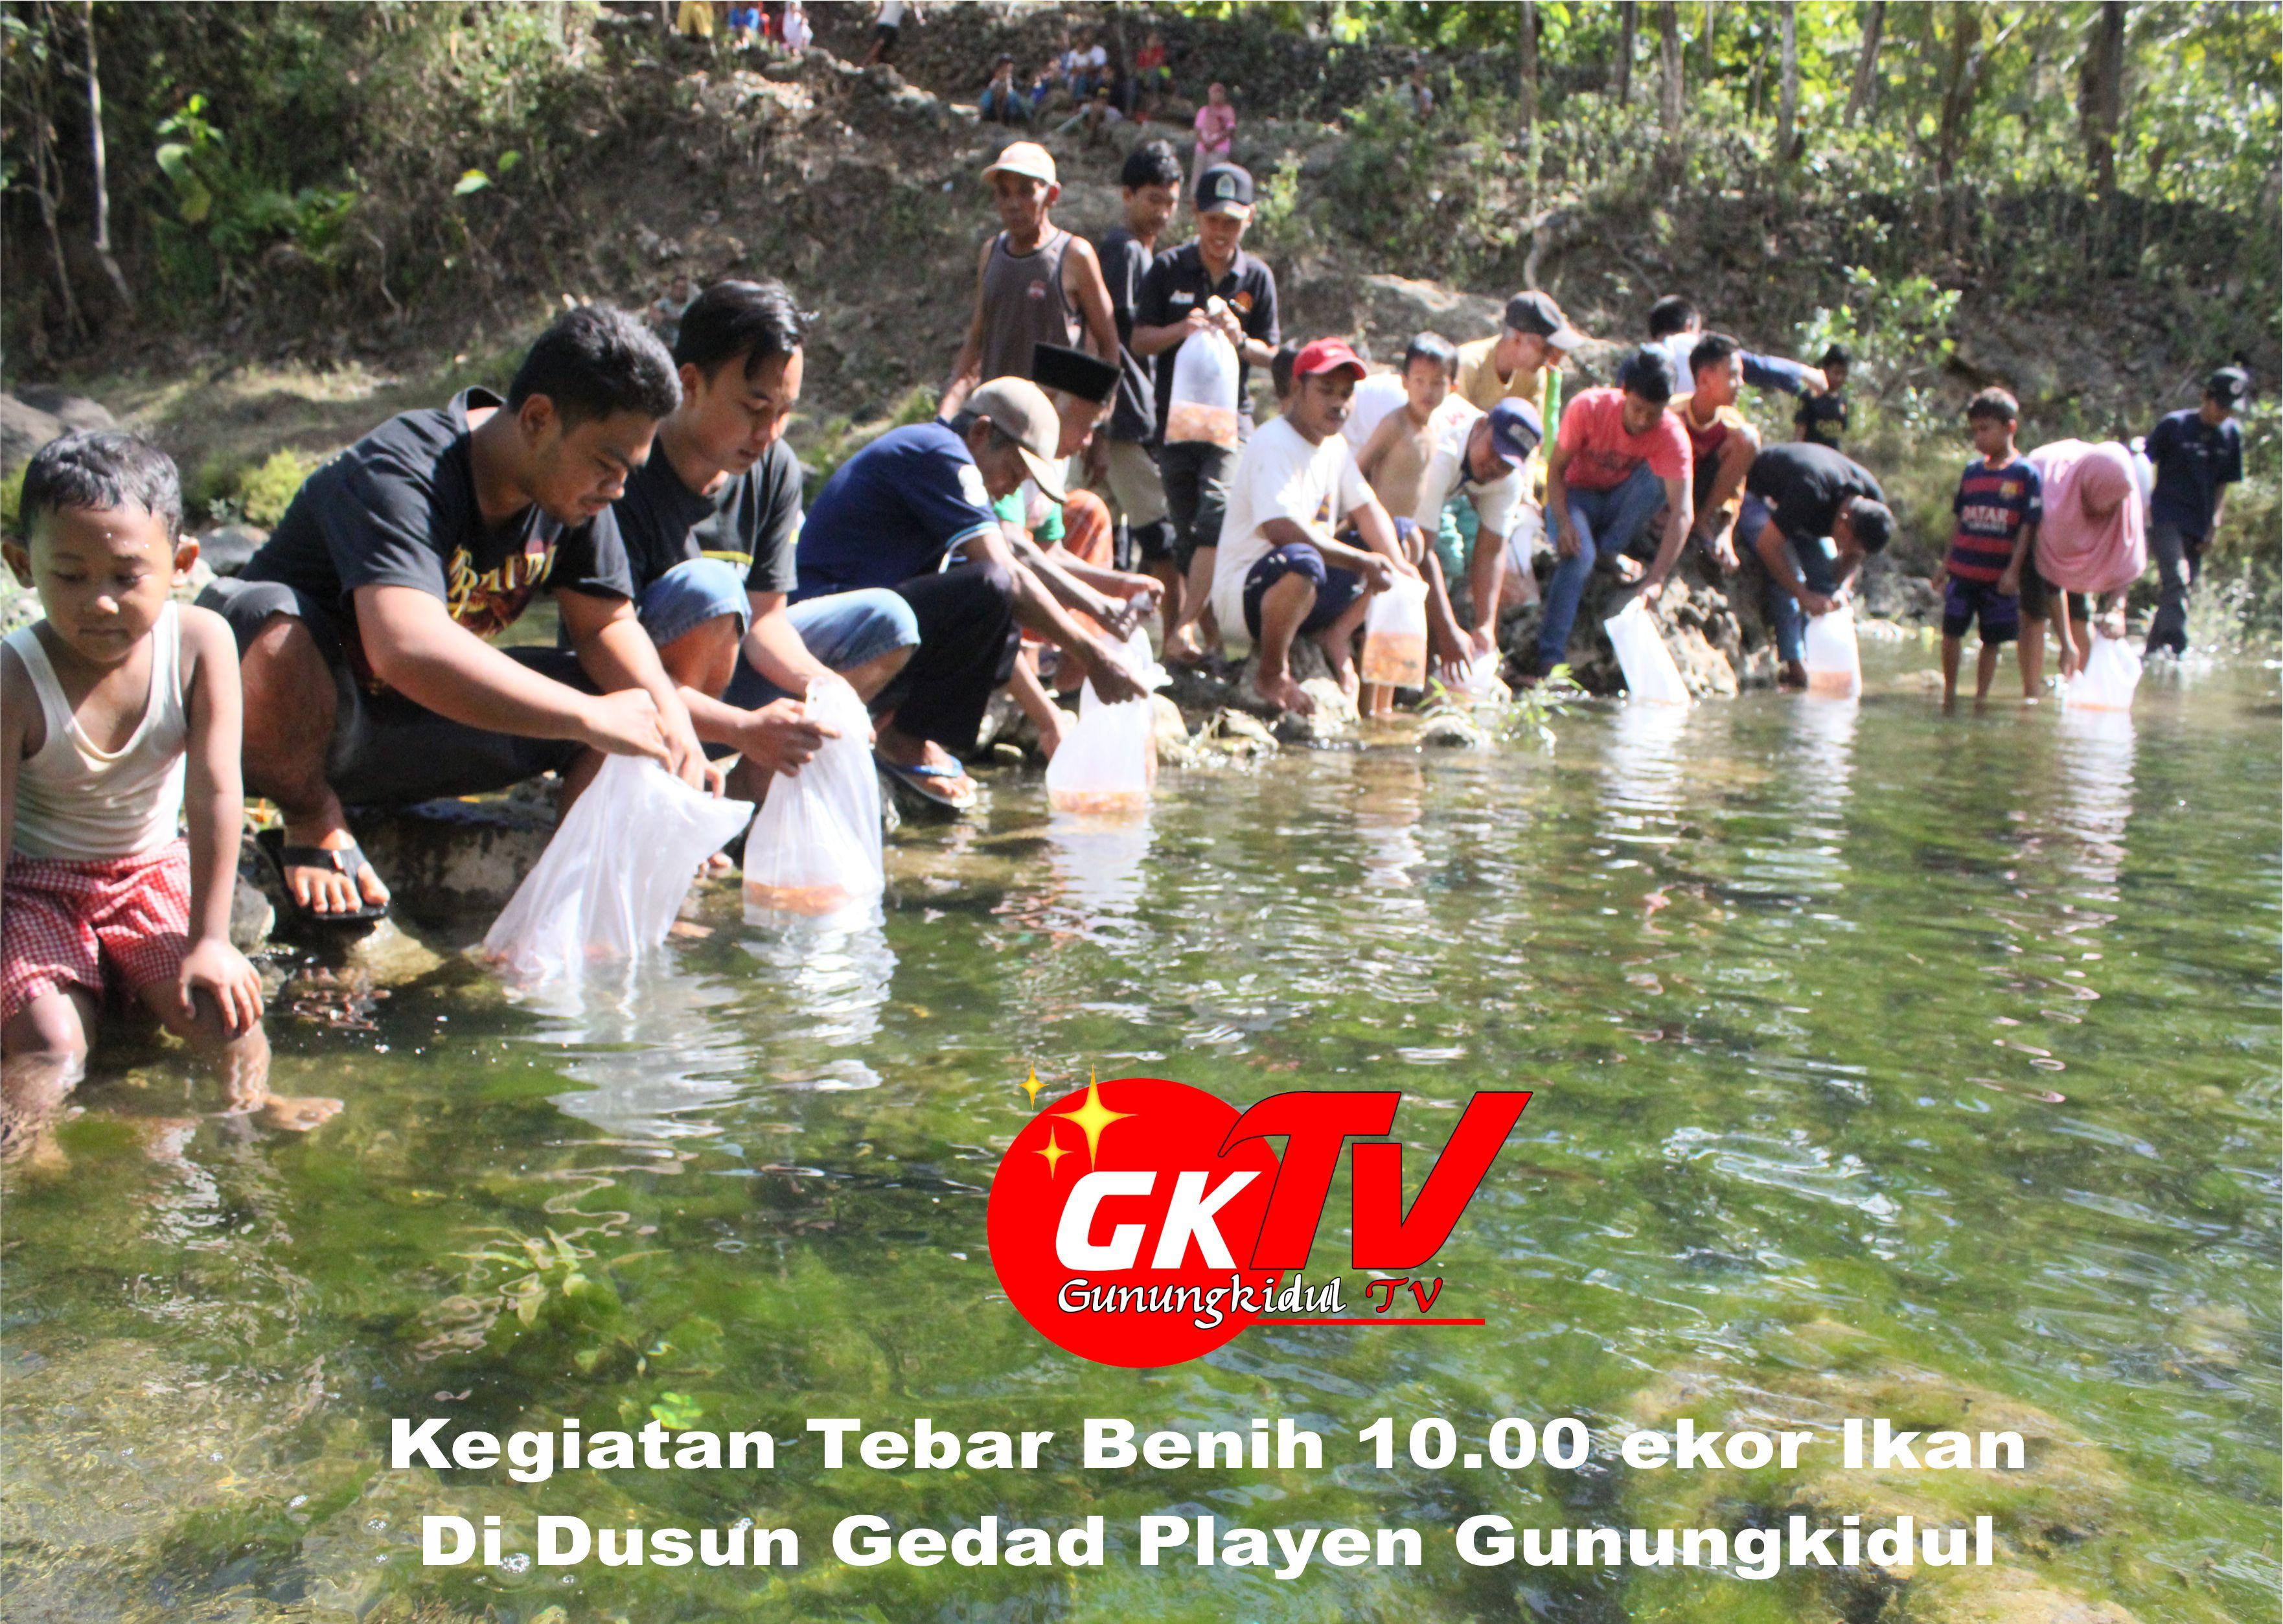 Tuk Konservasi Sungai, Warga Dusun Gedad Playen dan KKN UGM Sebar 10 000 Benih Ikan